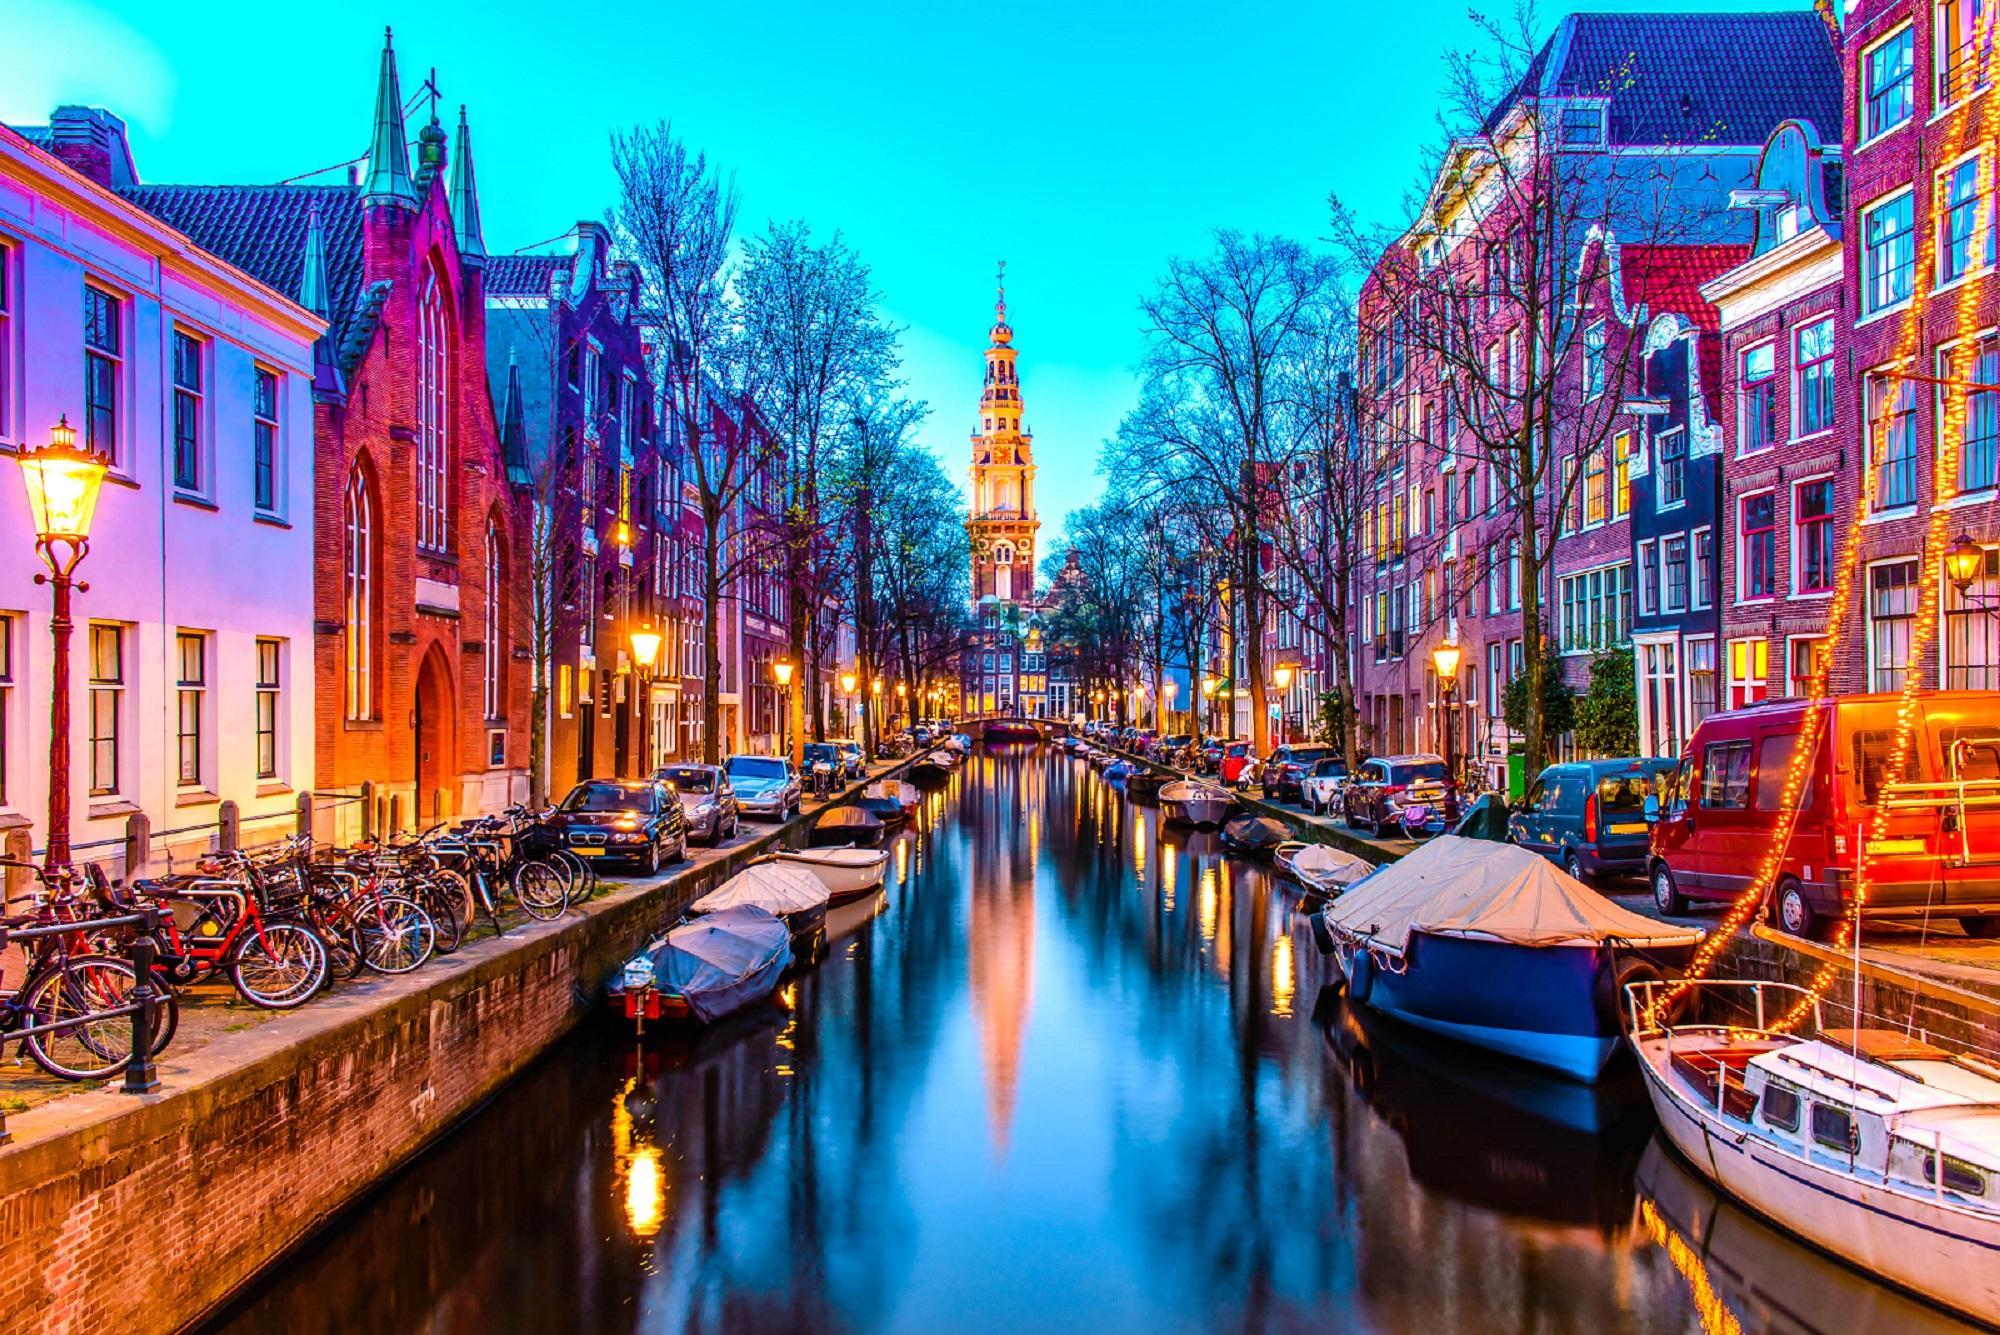 amsterdam - Photos